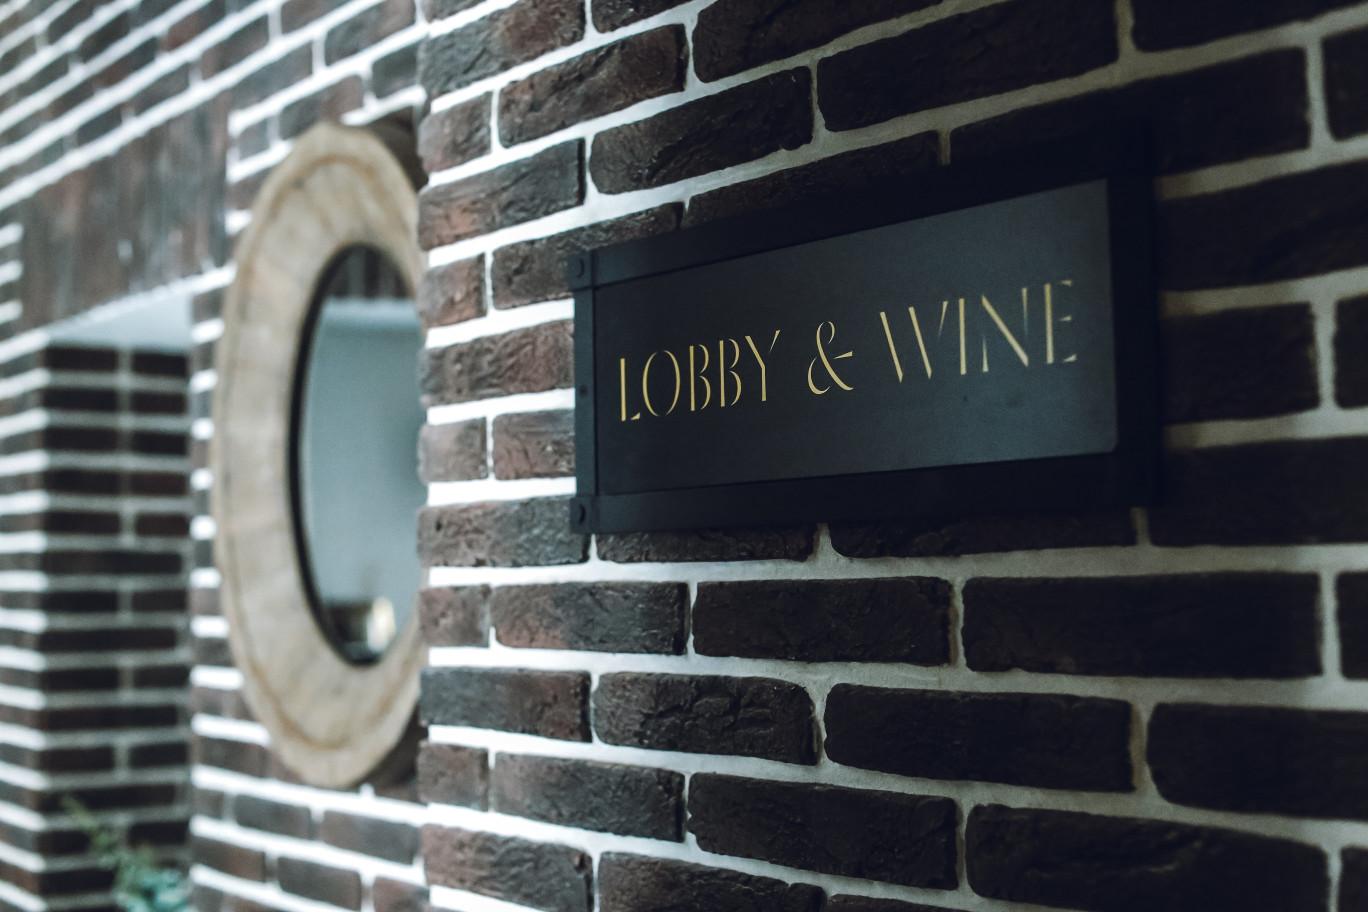 Lobby & wine